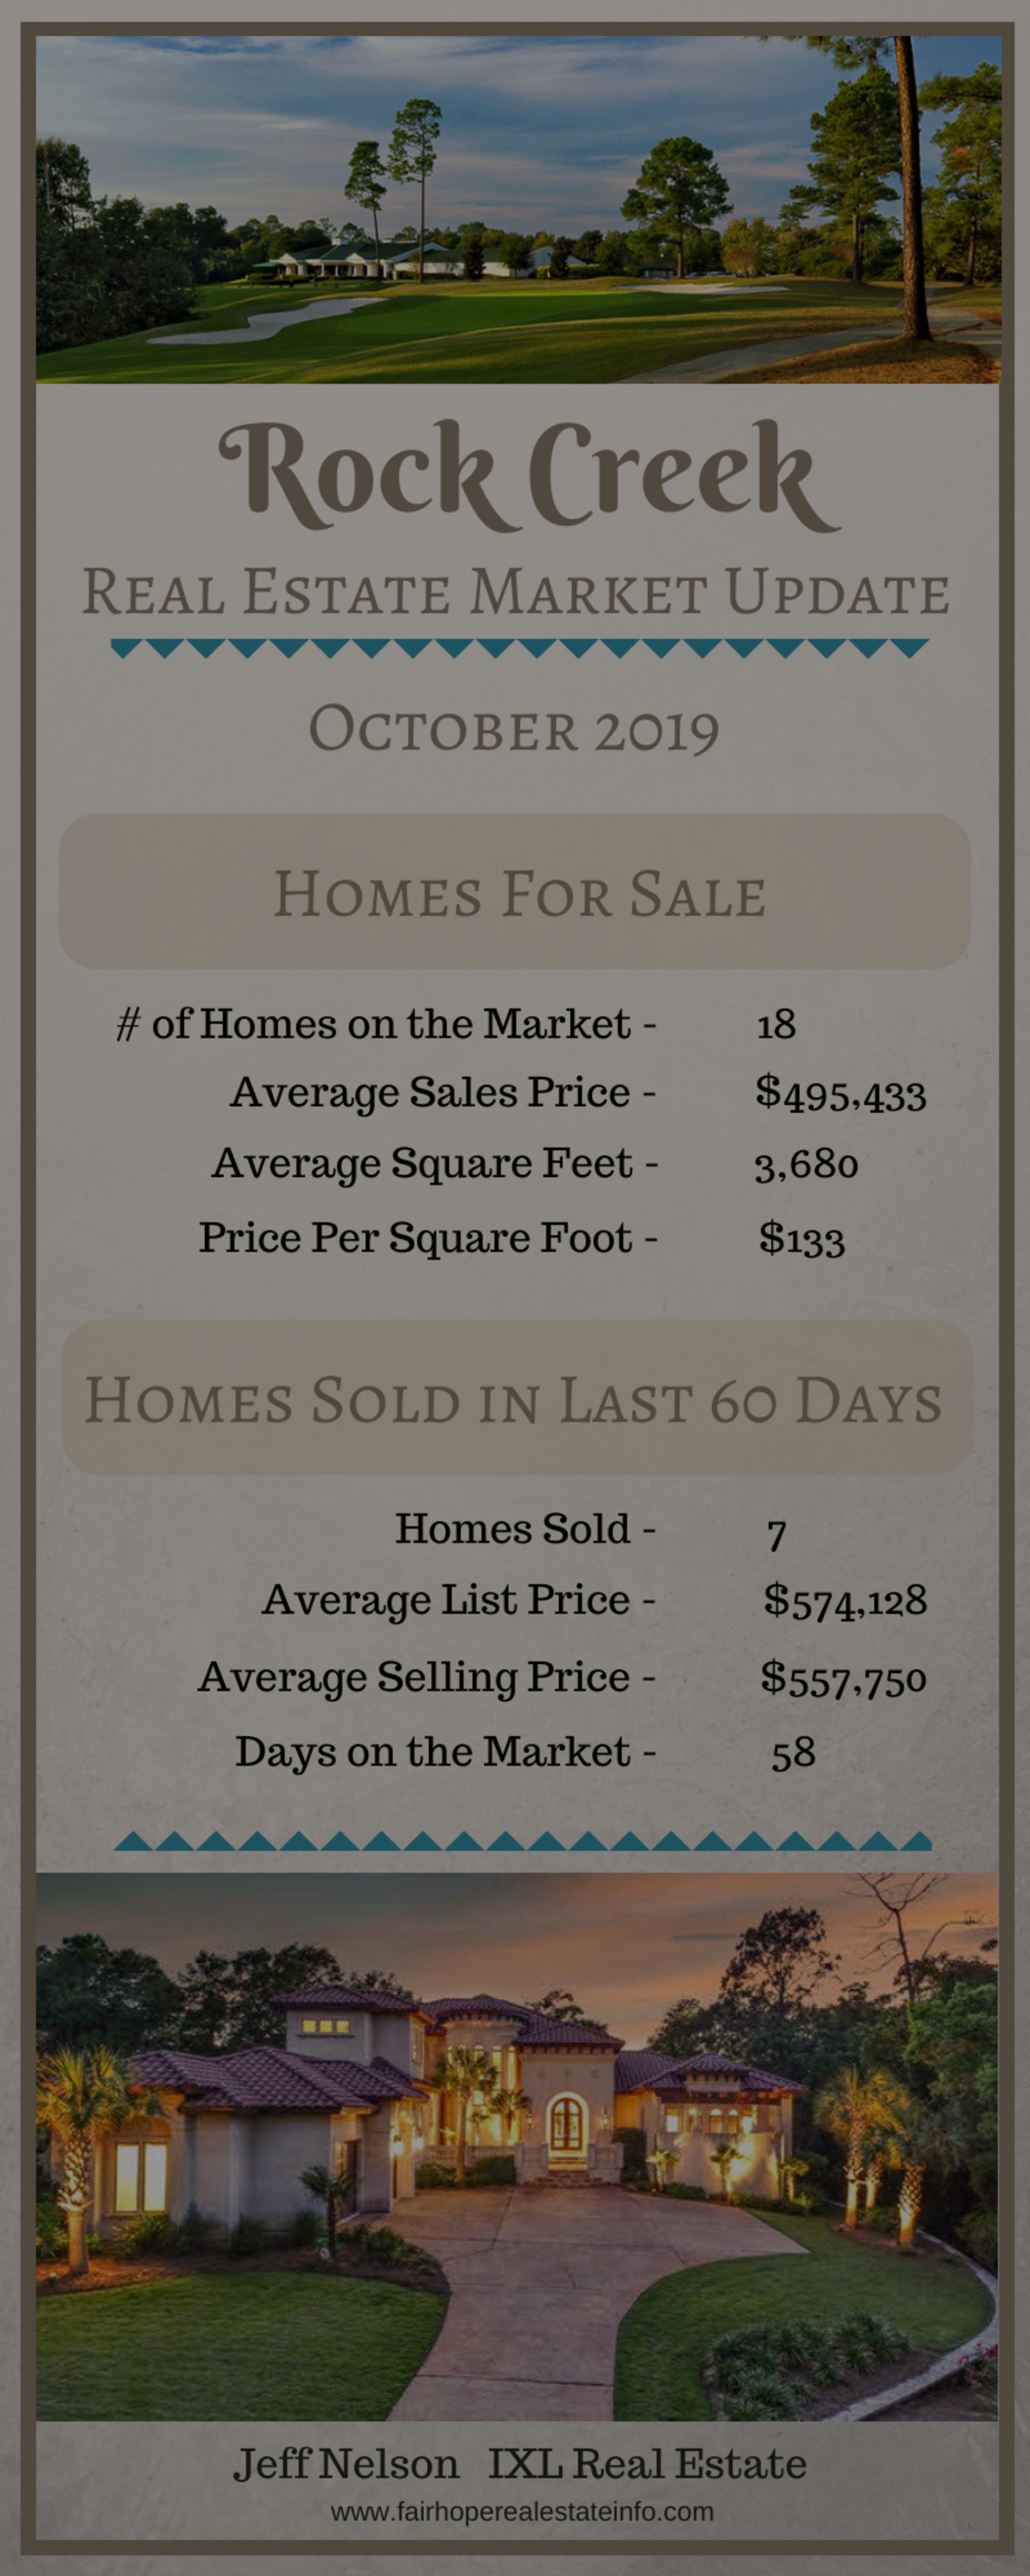 Rock Creek Real Estate Market Update – October 2019